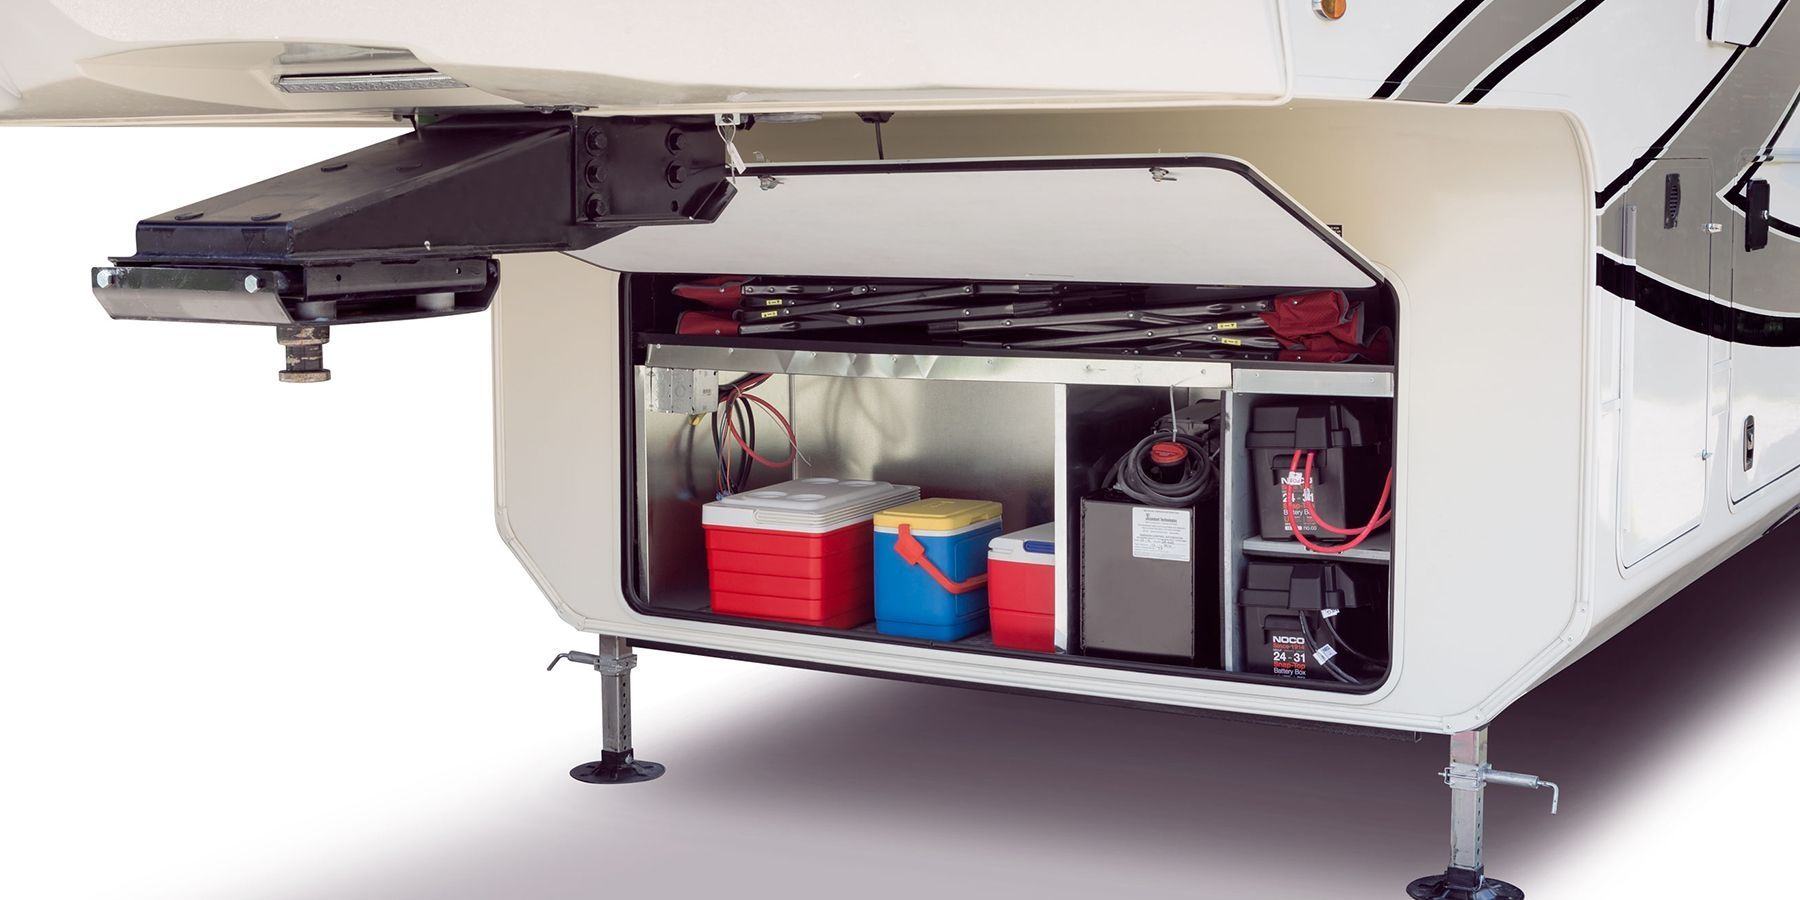 fifth wheel rv basement storage ideas   camping ideas   fifth wheel